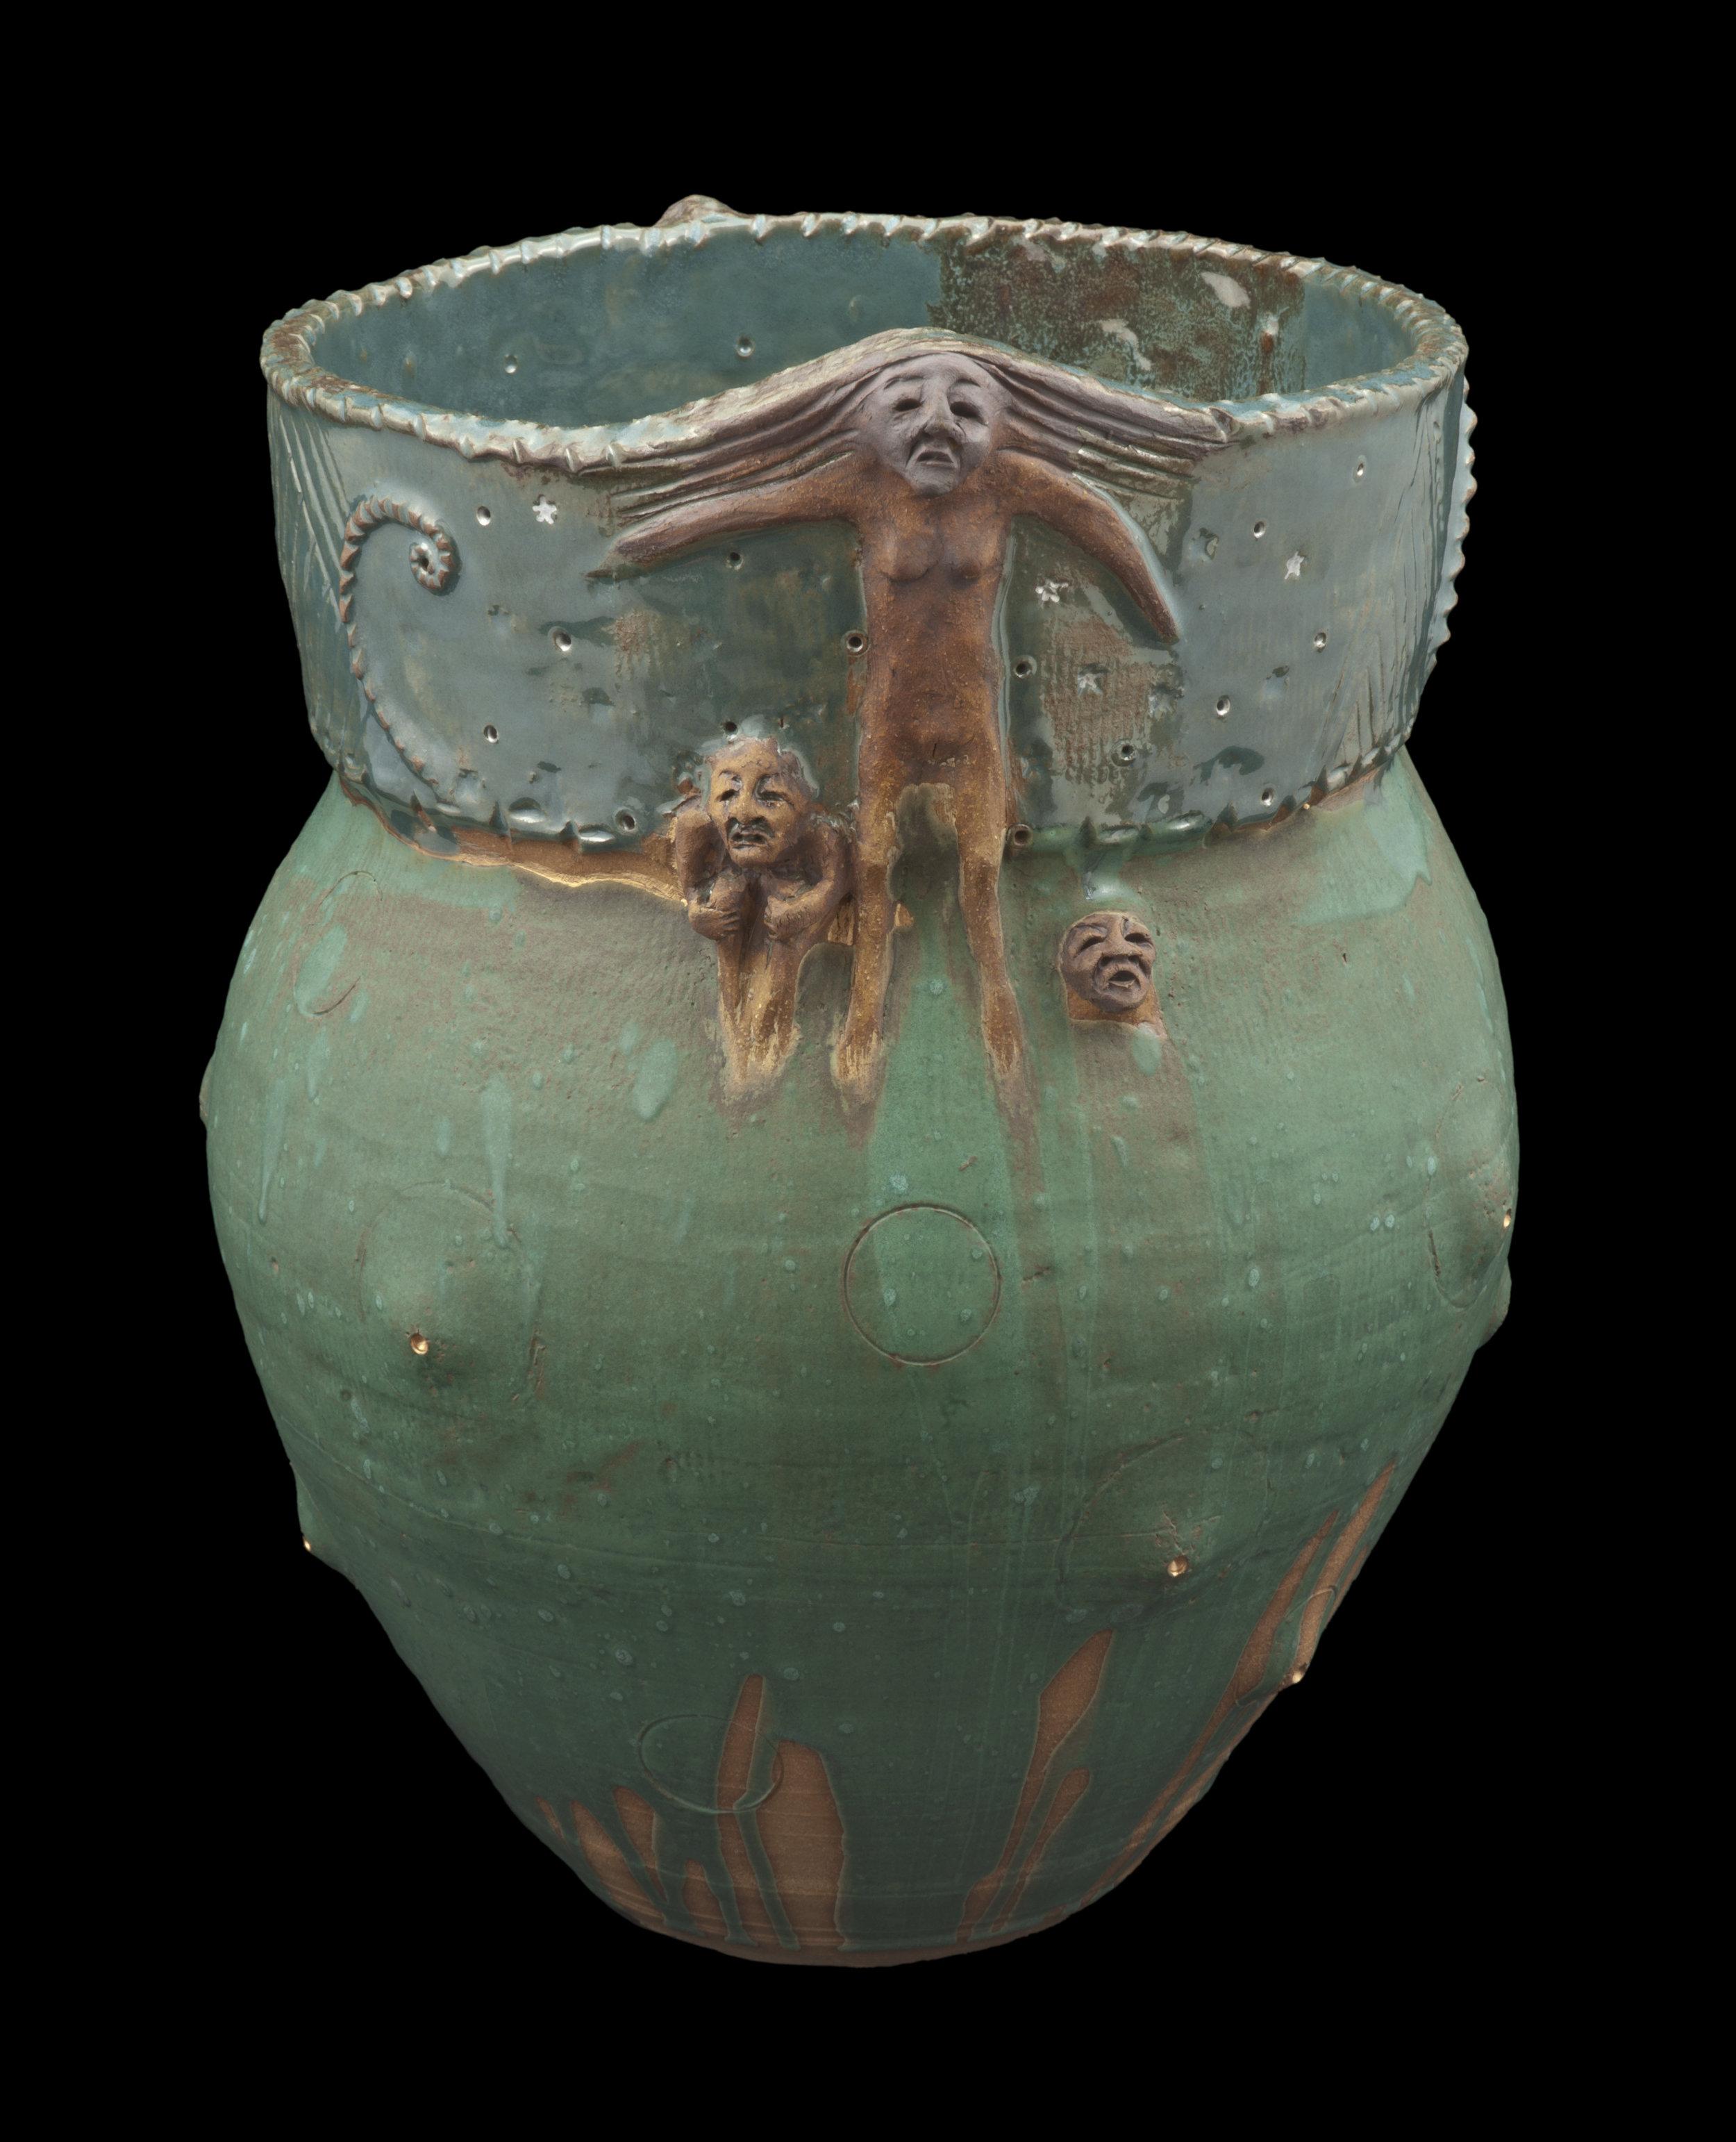 3-Peter_B_Jones_2013_Skywoman_Pot_Stoneware_copper_green_glaze_14_Hart.jpg